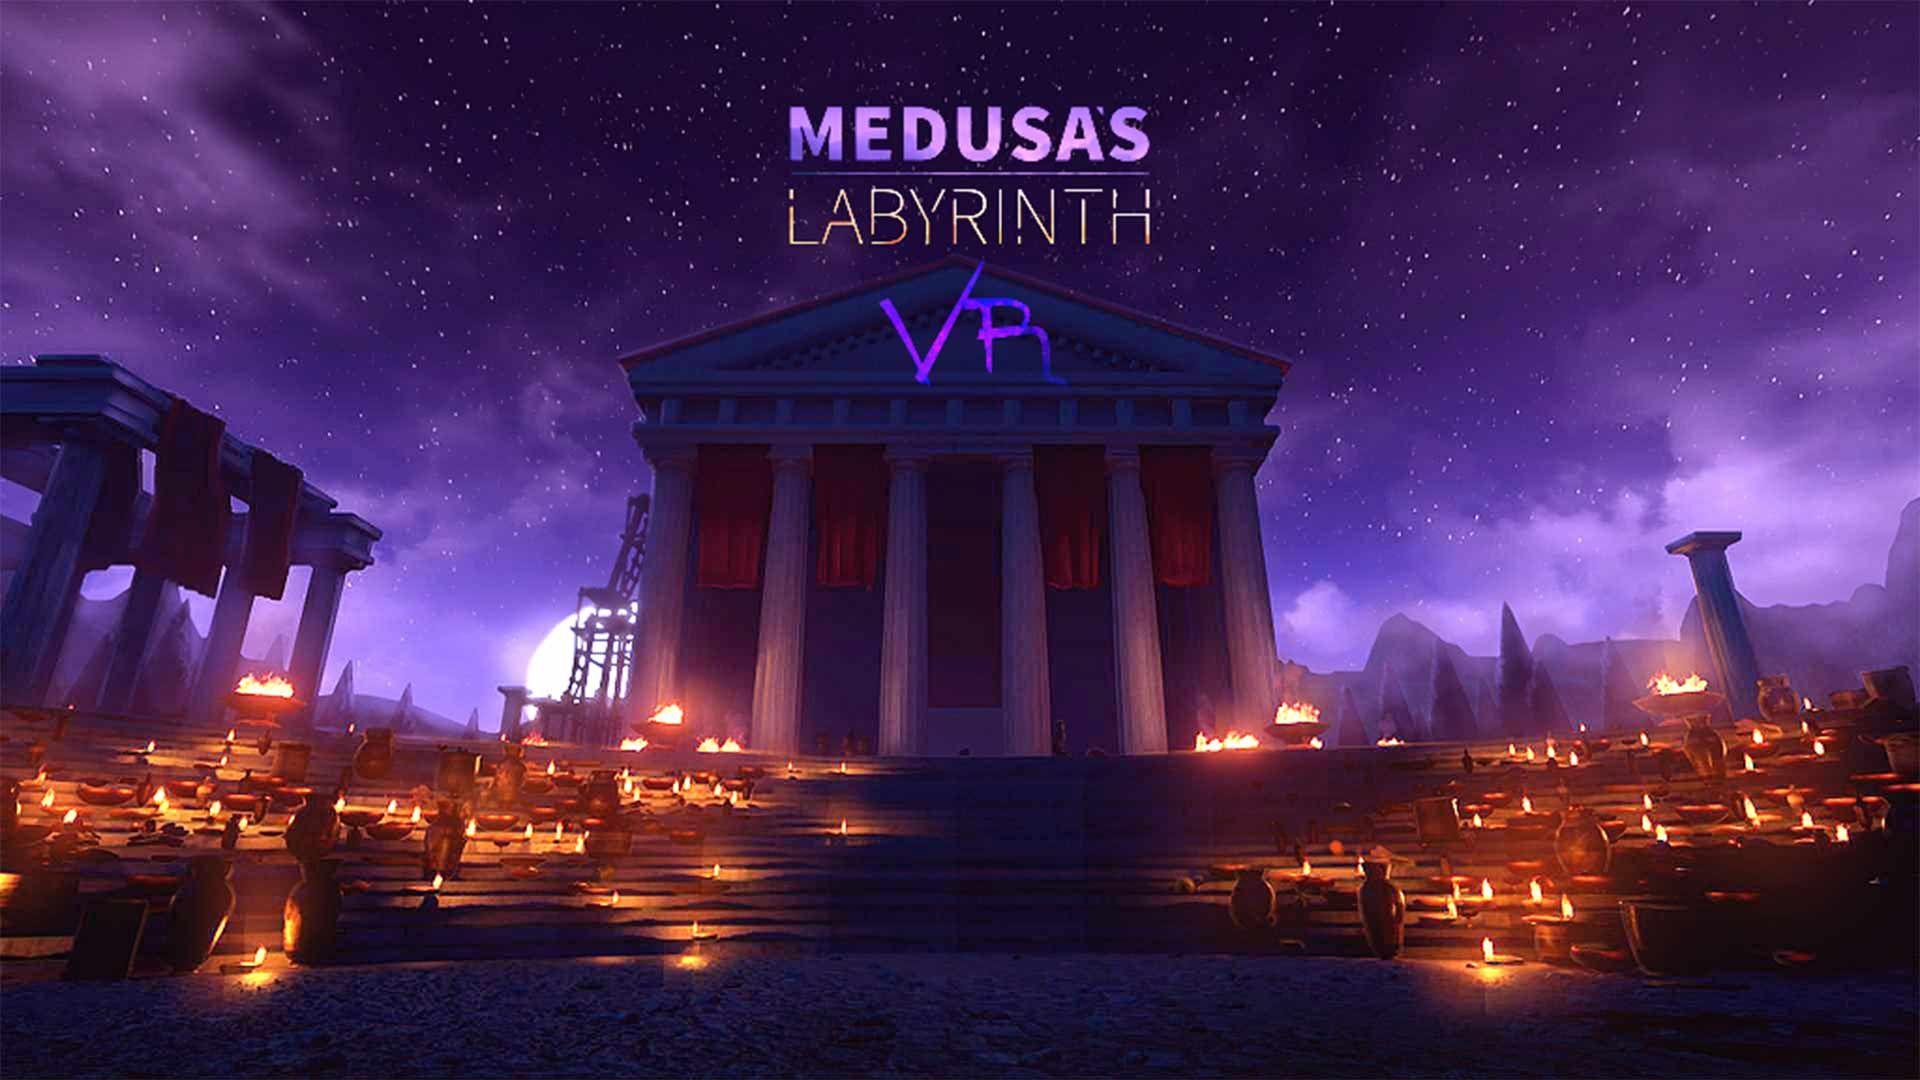 Medusa's Labyrinth VR Game Labyrinth, Vr games, Ancient